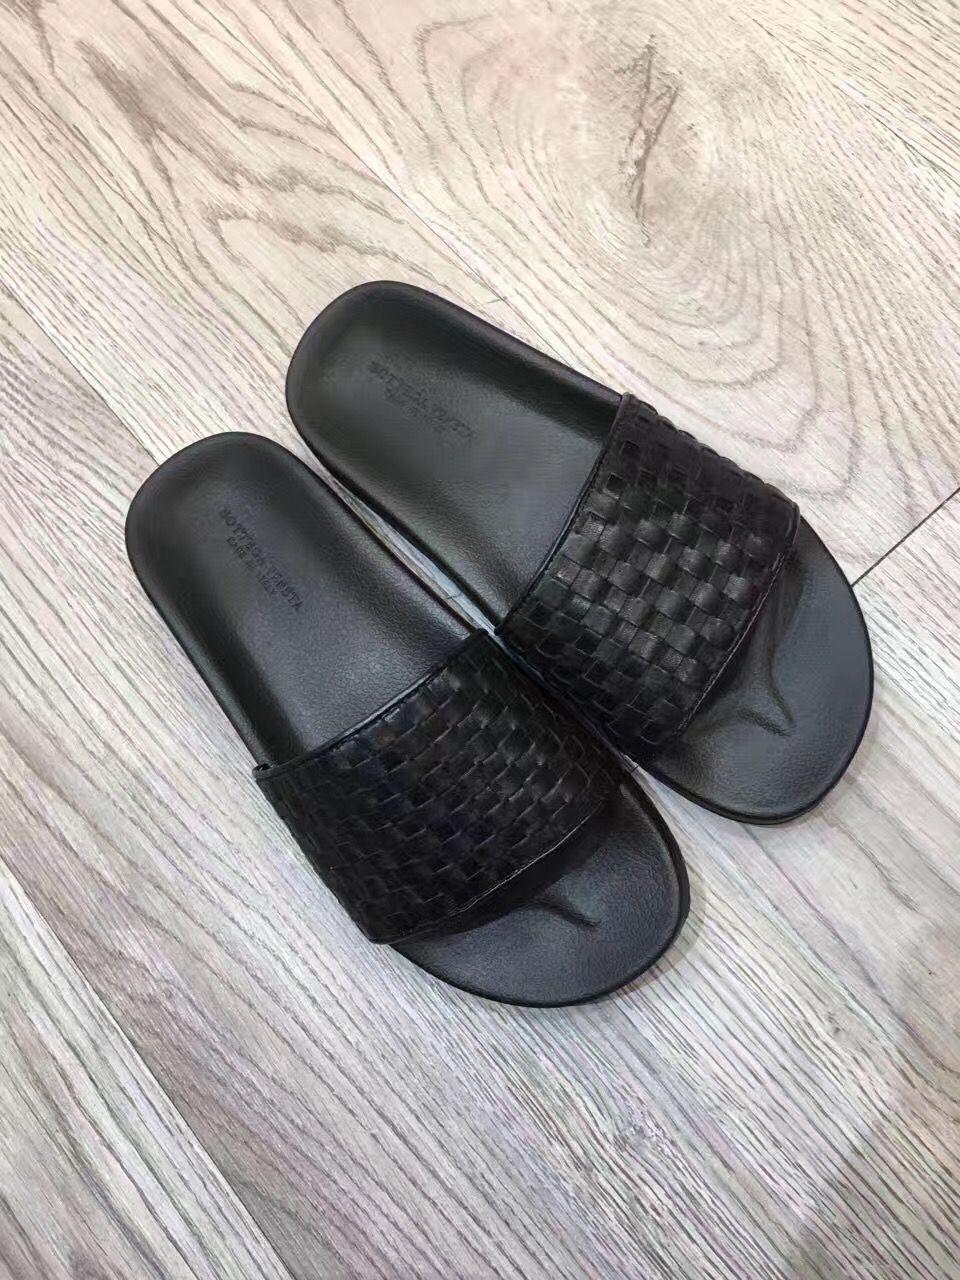 ccca17f9c2f7 Bottega Veneta man shoes weave leather slippers slides